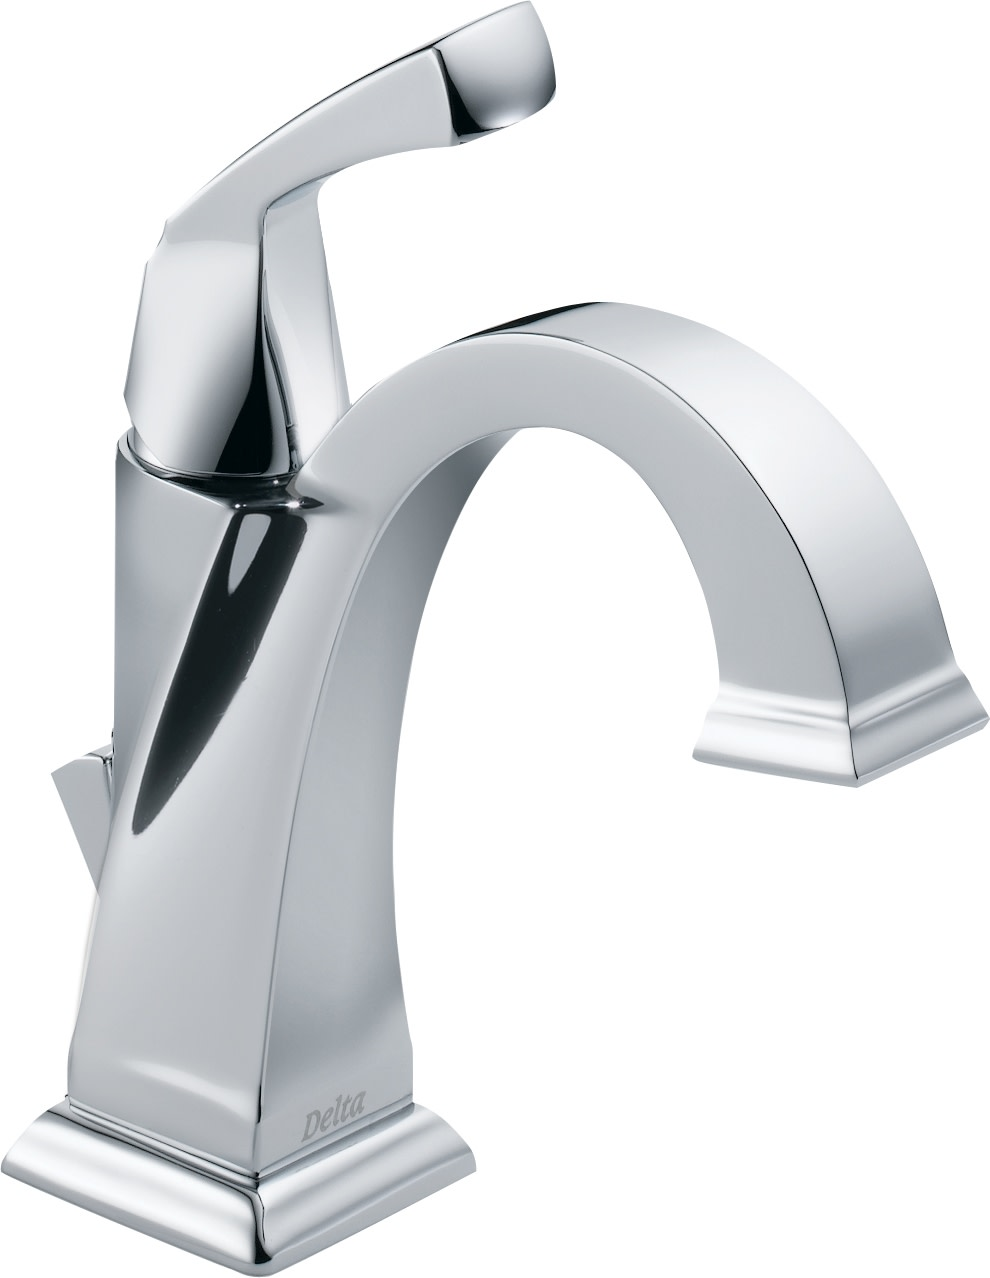 Delta 551 Dst Chrome Dryden Single Hole Bathroom Faucet With Diamond